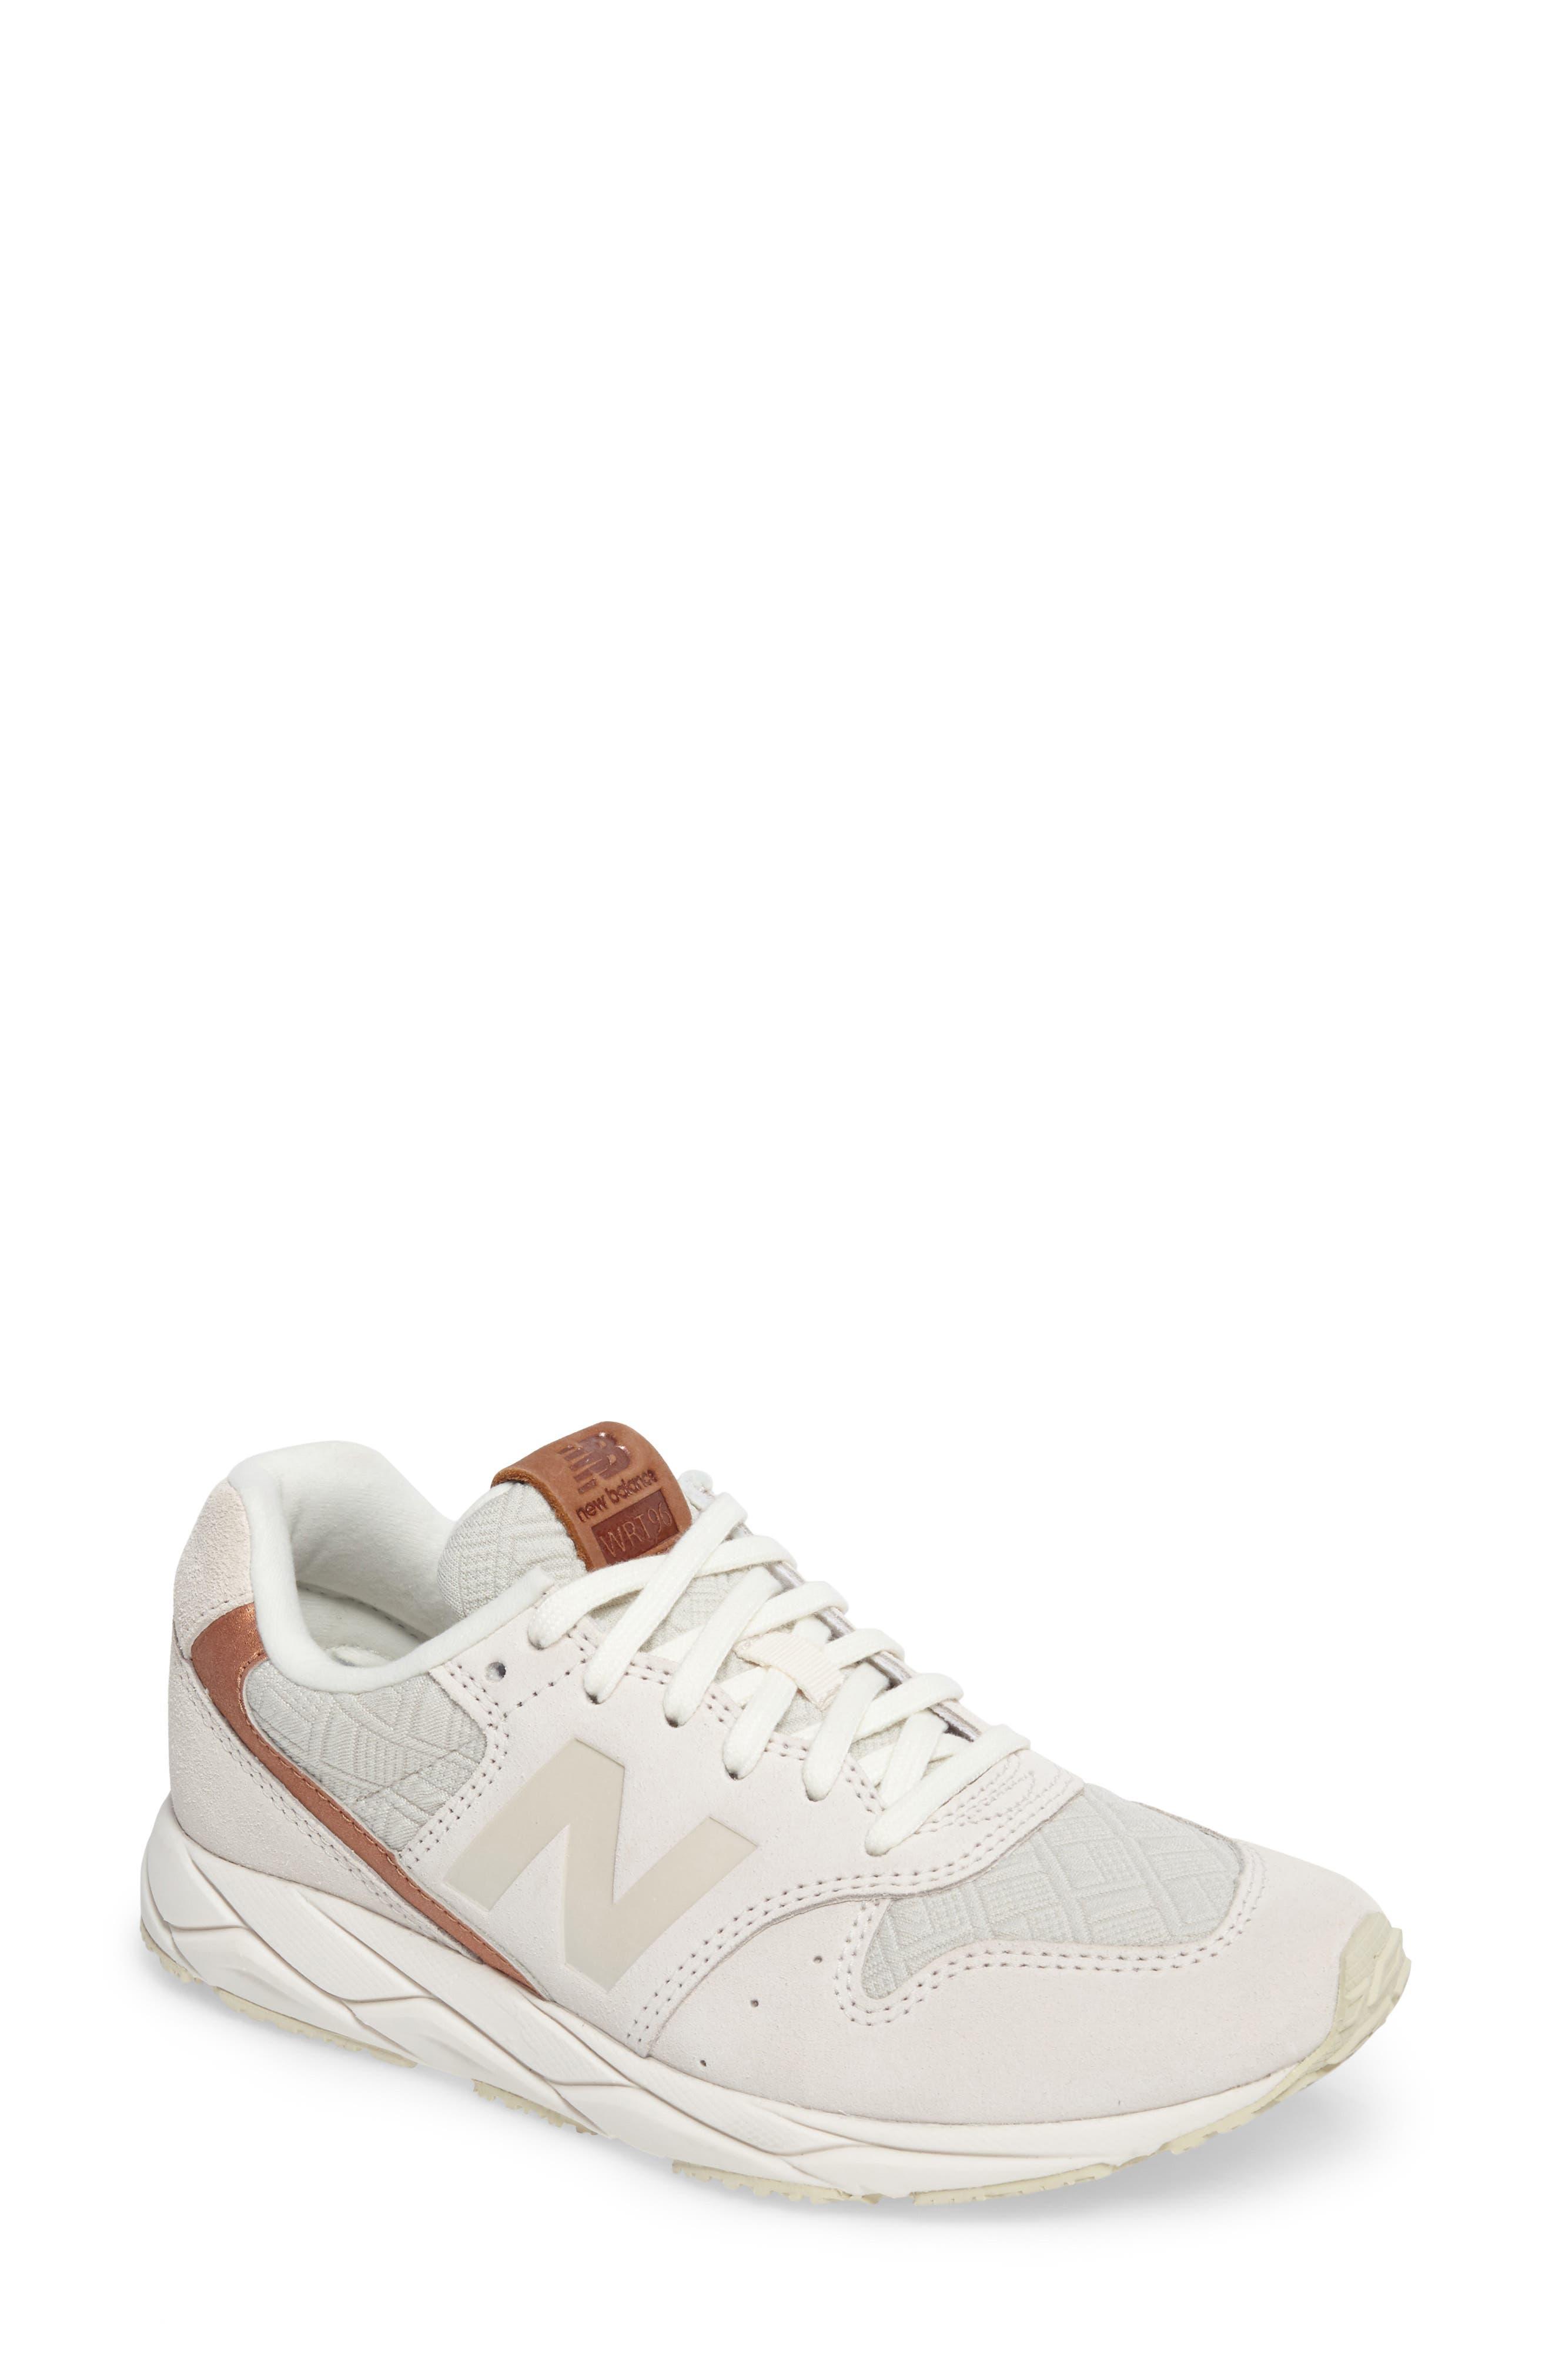 96 Mash-Up Sneaker,                         Main,                         color, Sea Salt